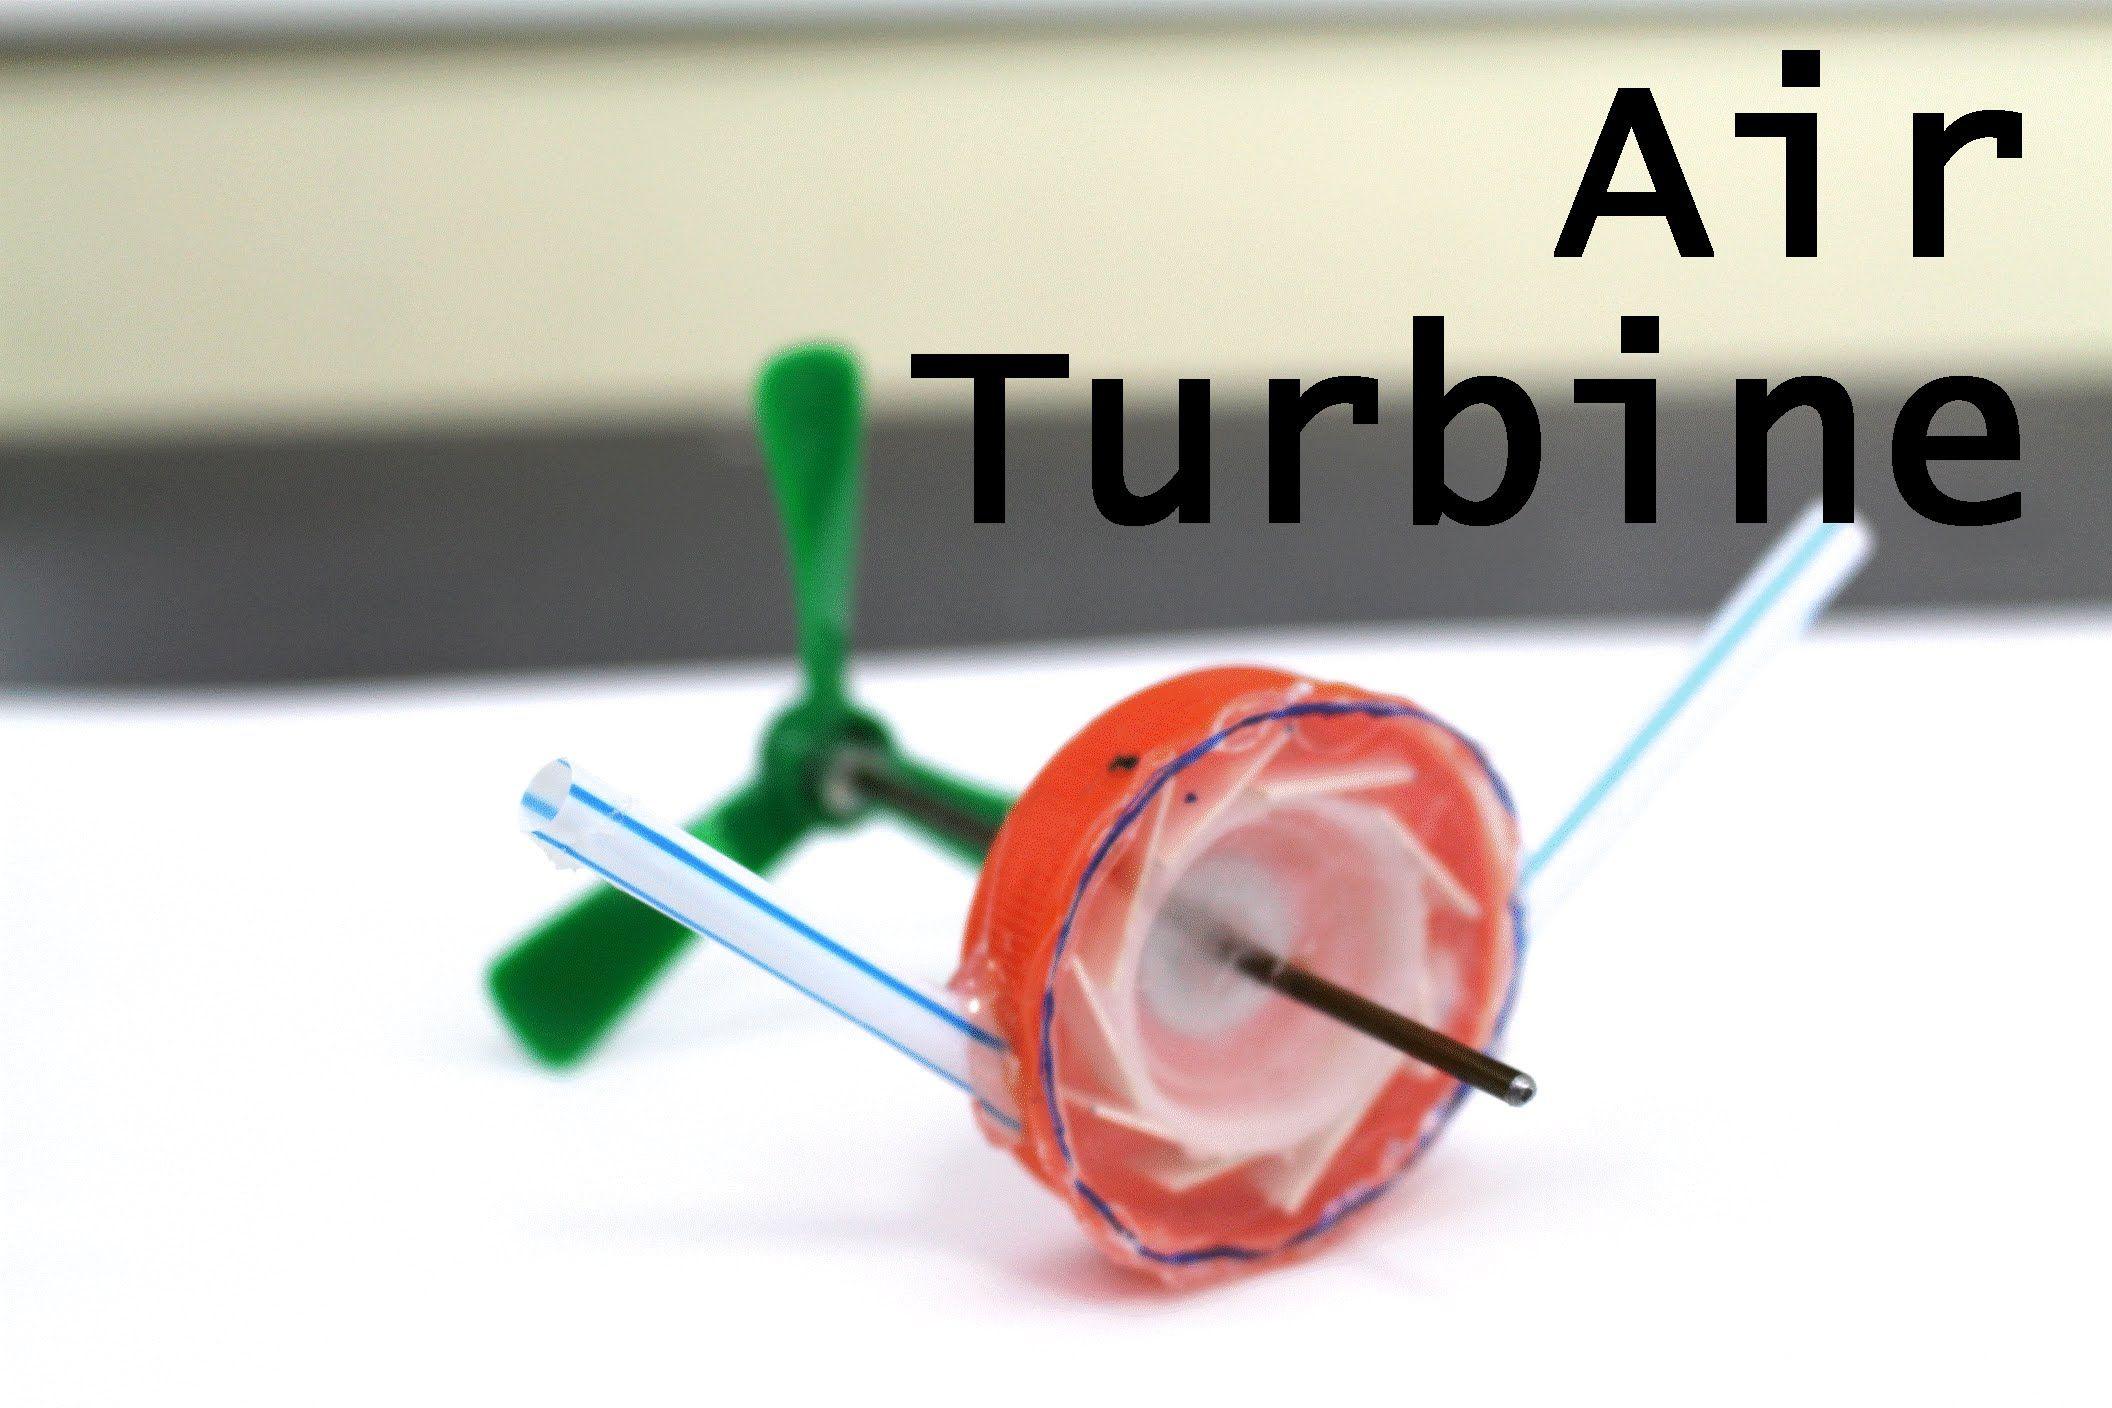 How to Make a Mini Compressed Air Turbine Plane crafts